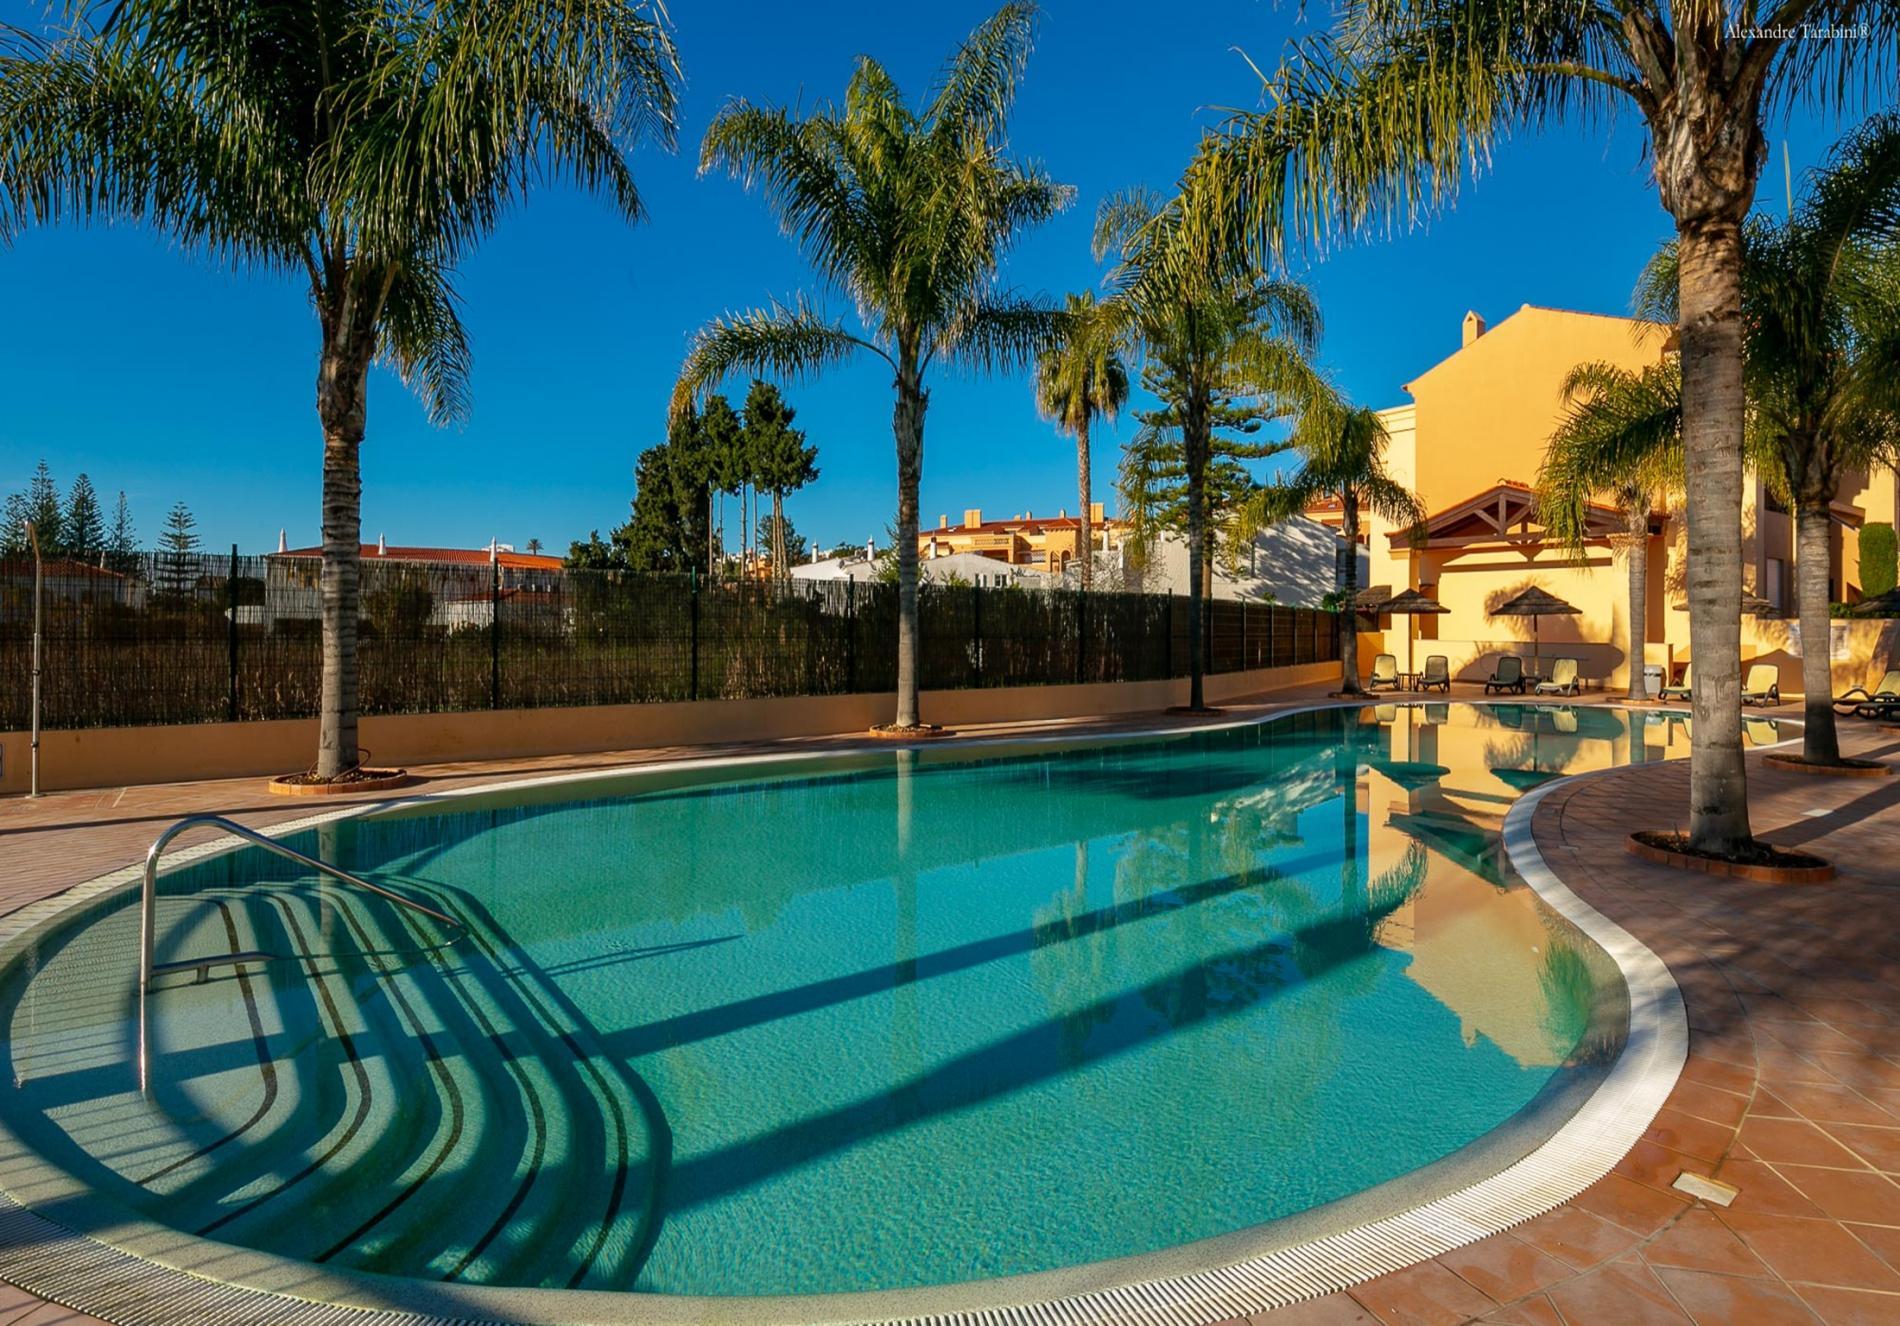 Ferienwohnung A24 - LuzBay Beach Apartment (2558091), Luz, , Algarve, Portugal, Bild 32